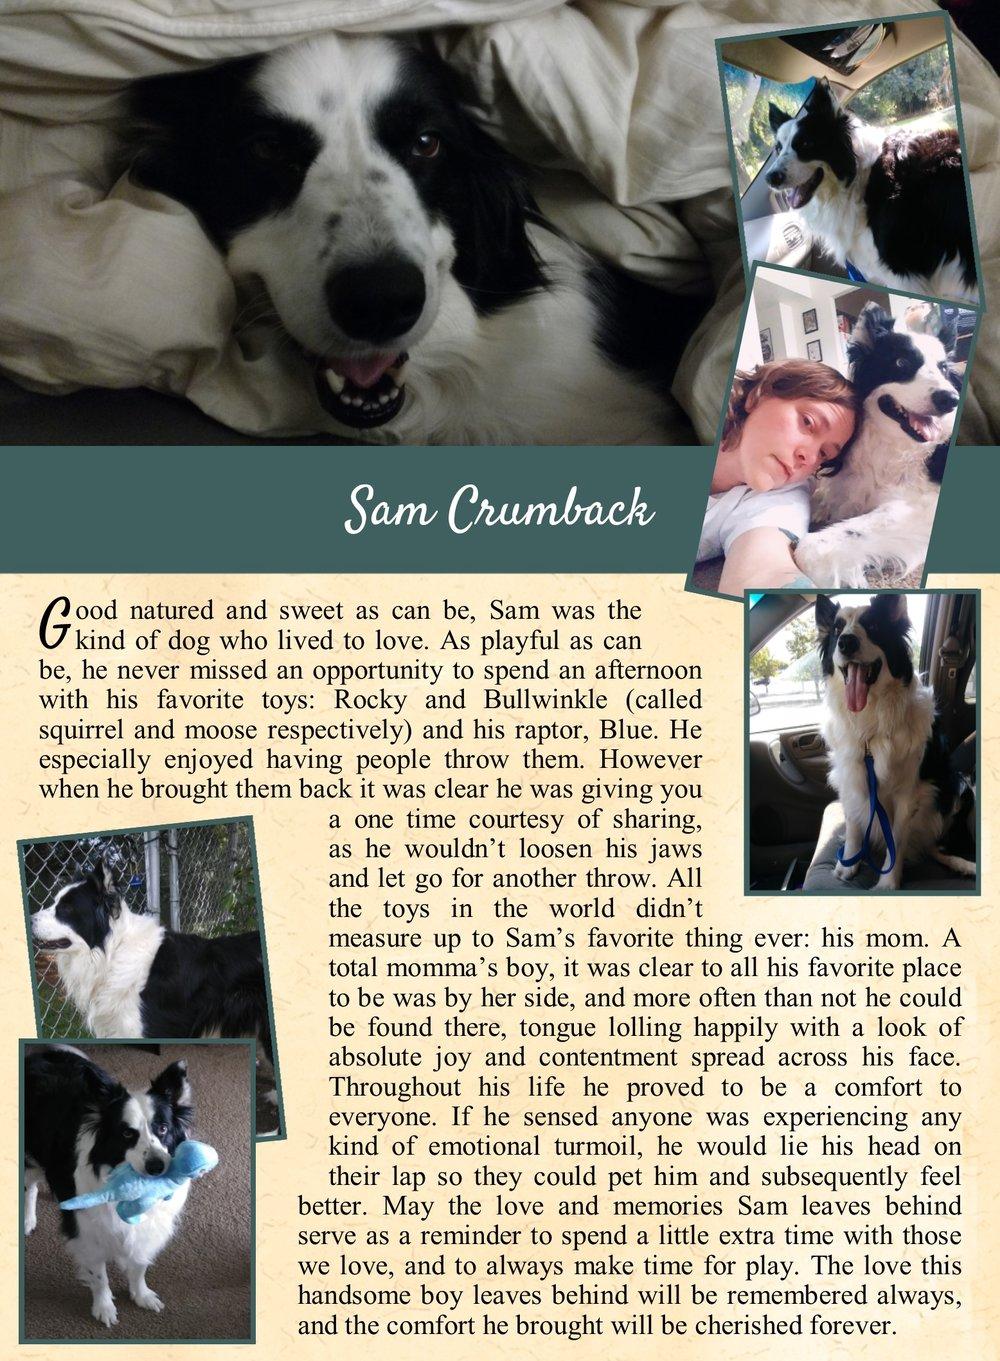 Sam Crumback